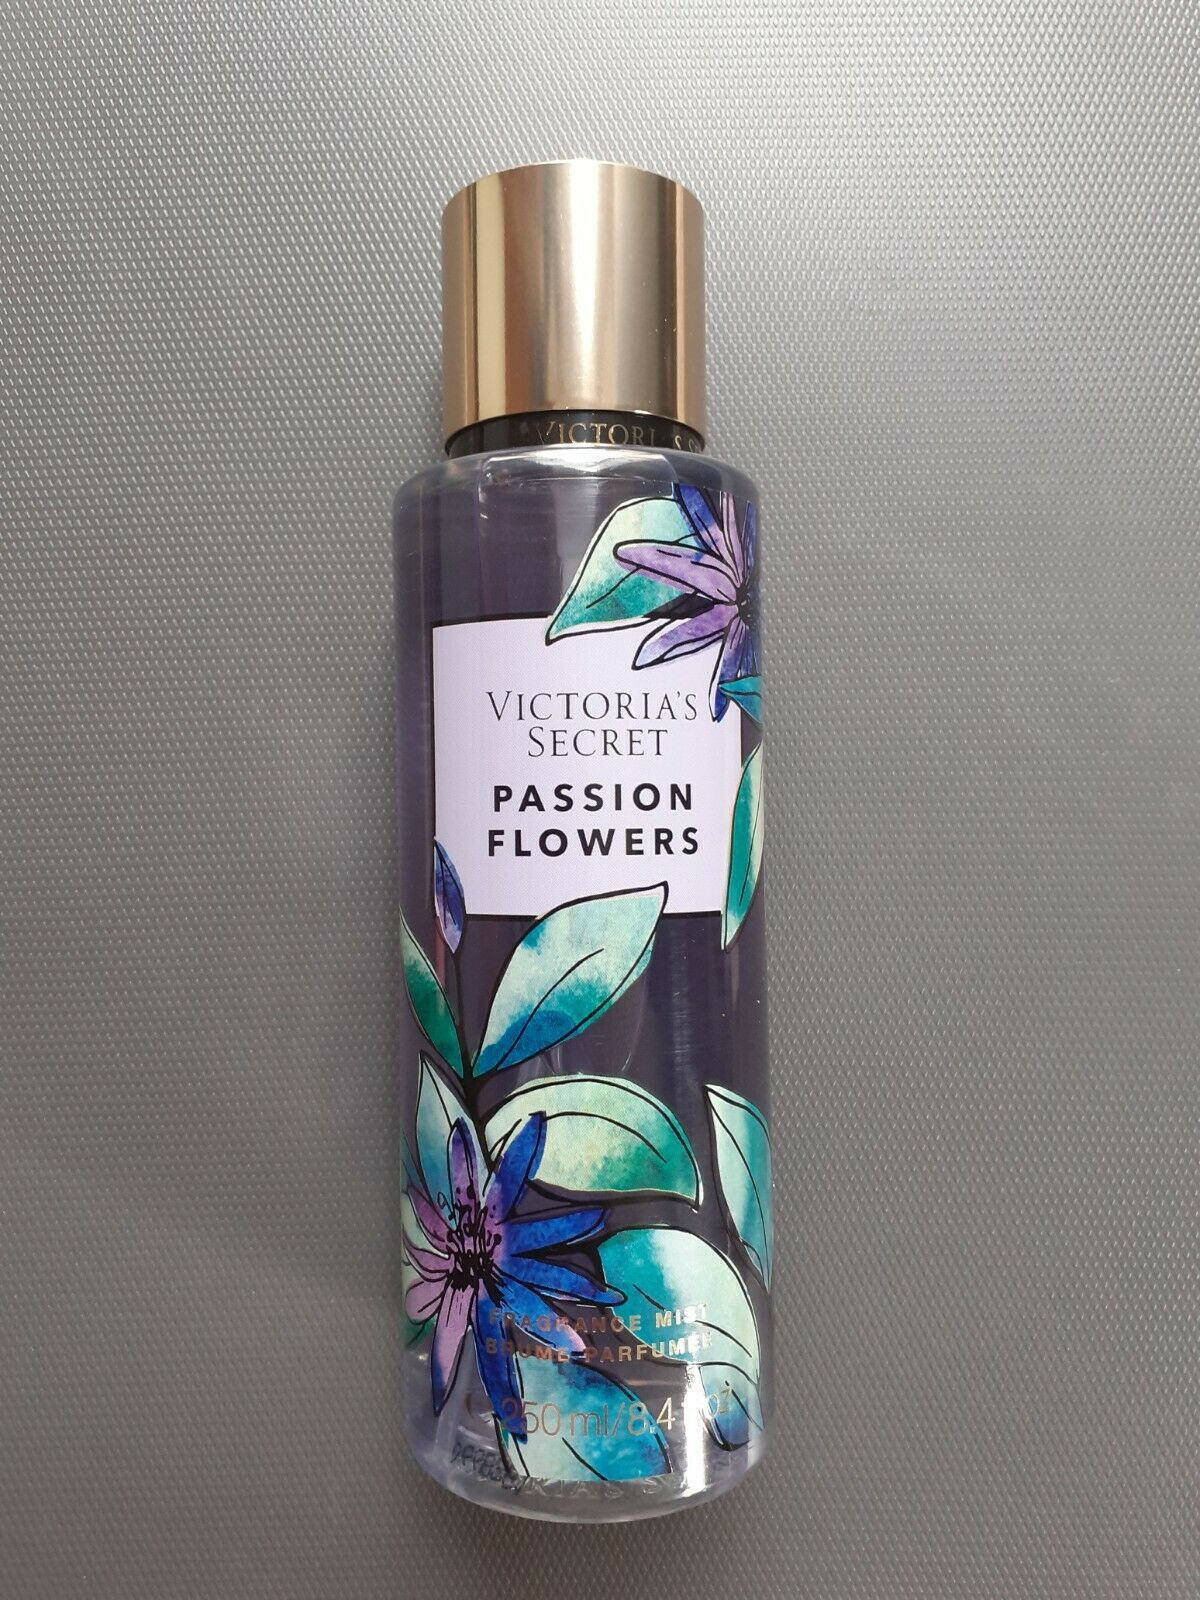 Secret Passion Flowers Perfume